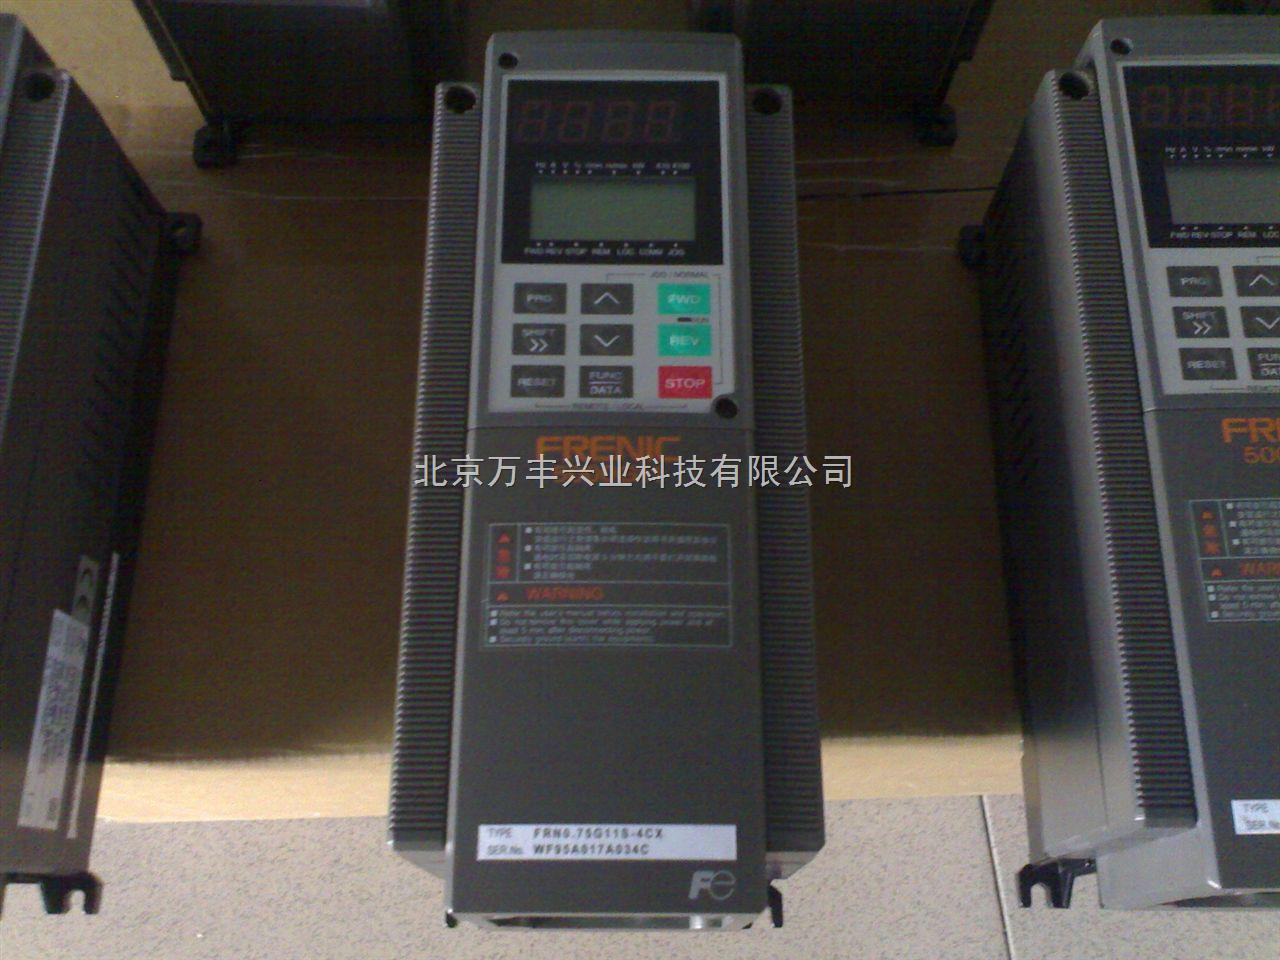 frn315p11s-4cx 富士变频器frn315p11s-4cx